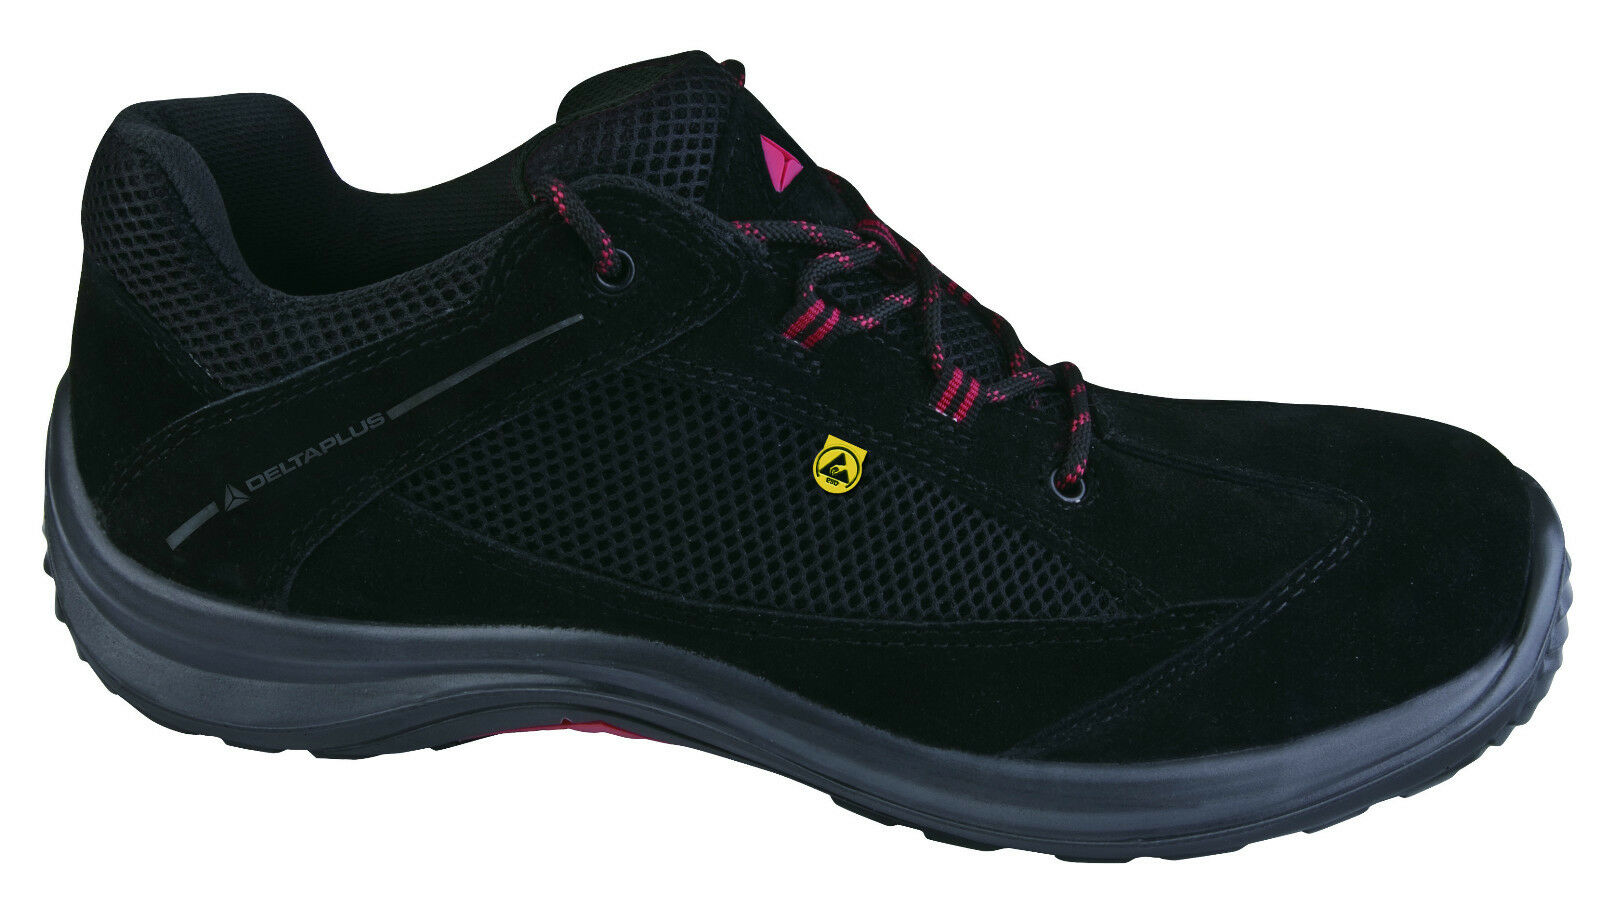 Delta Plus Panoply Viagi ESD nero Ladies Composite Toe Safety Trainers scarpe